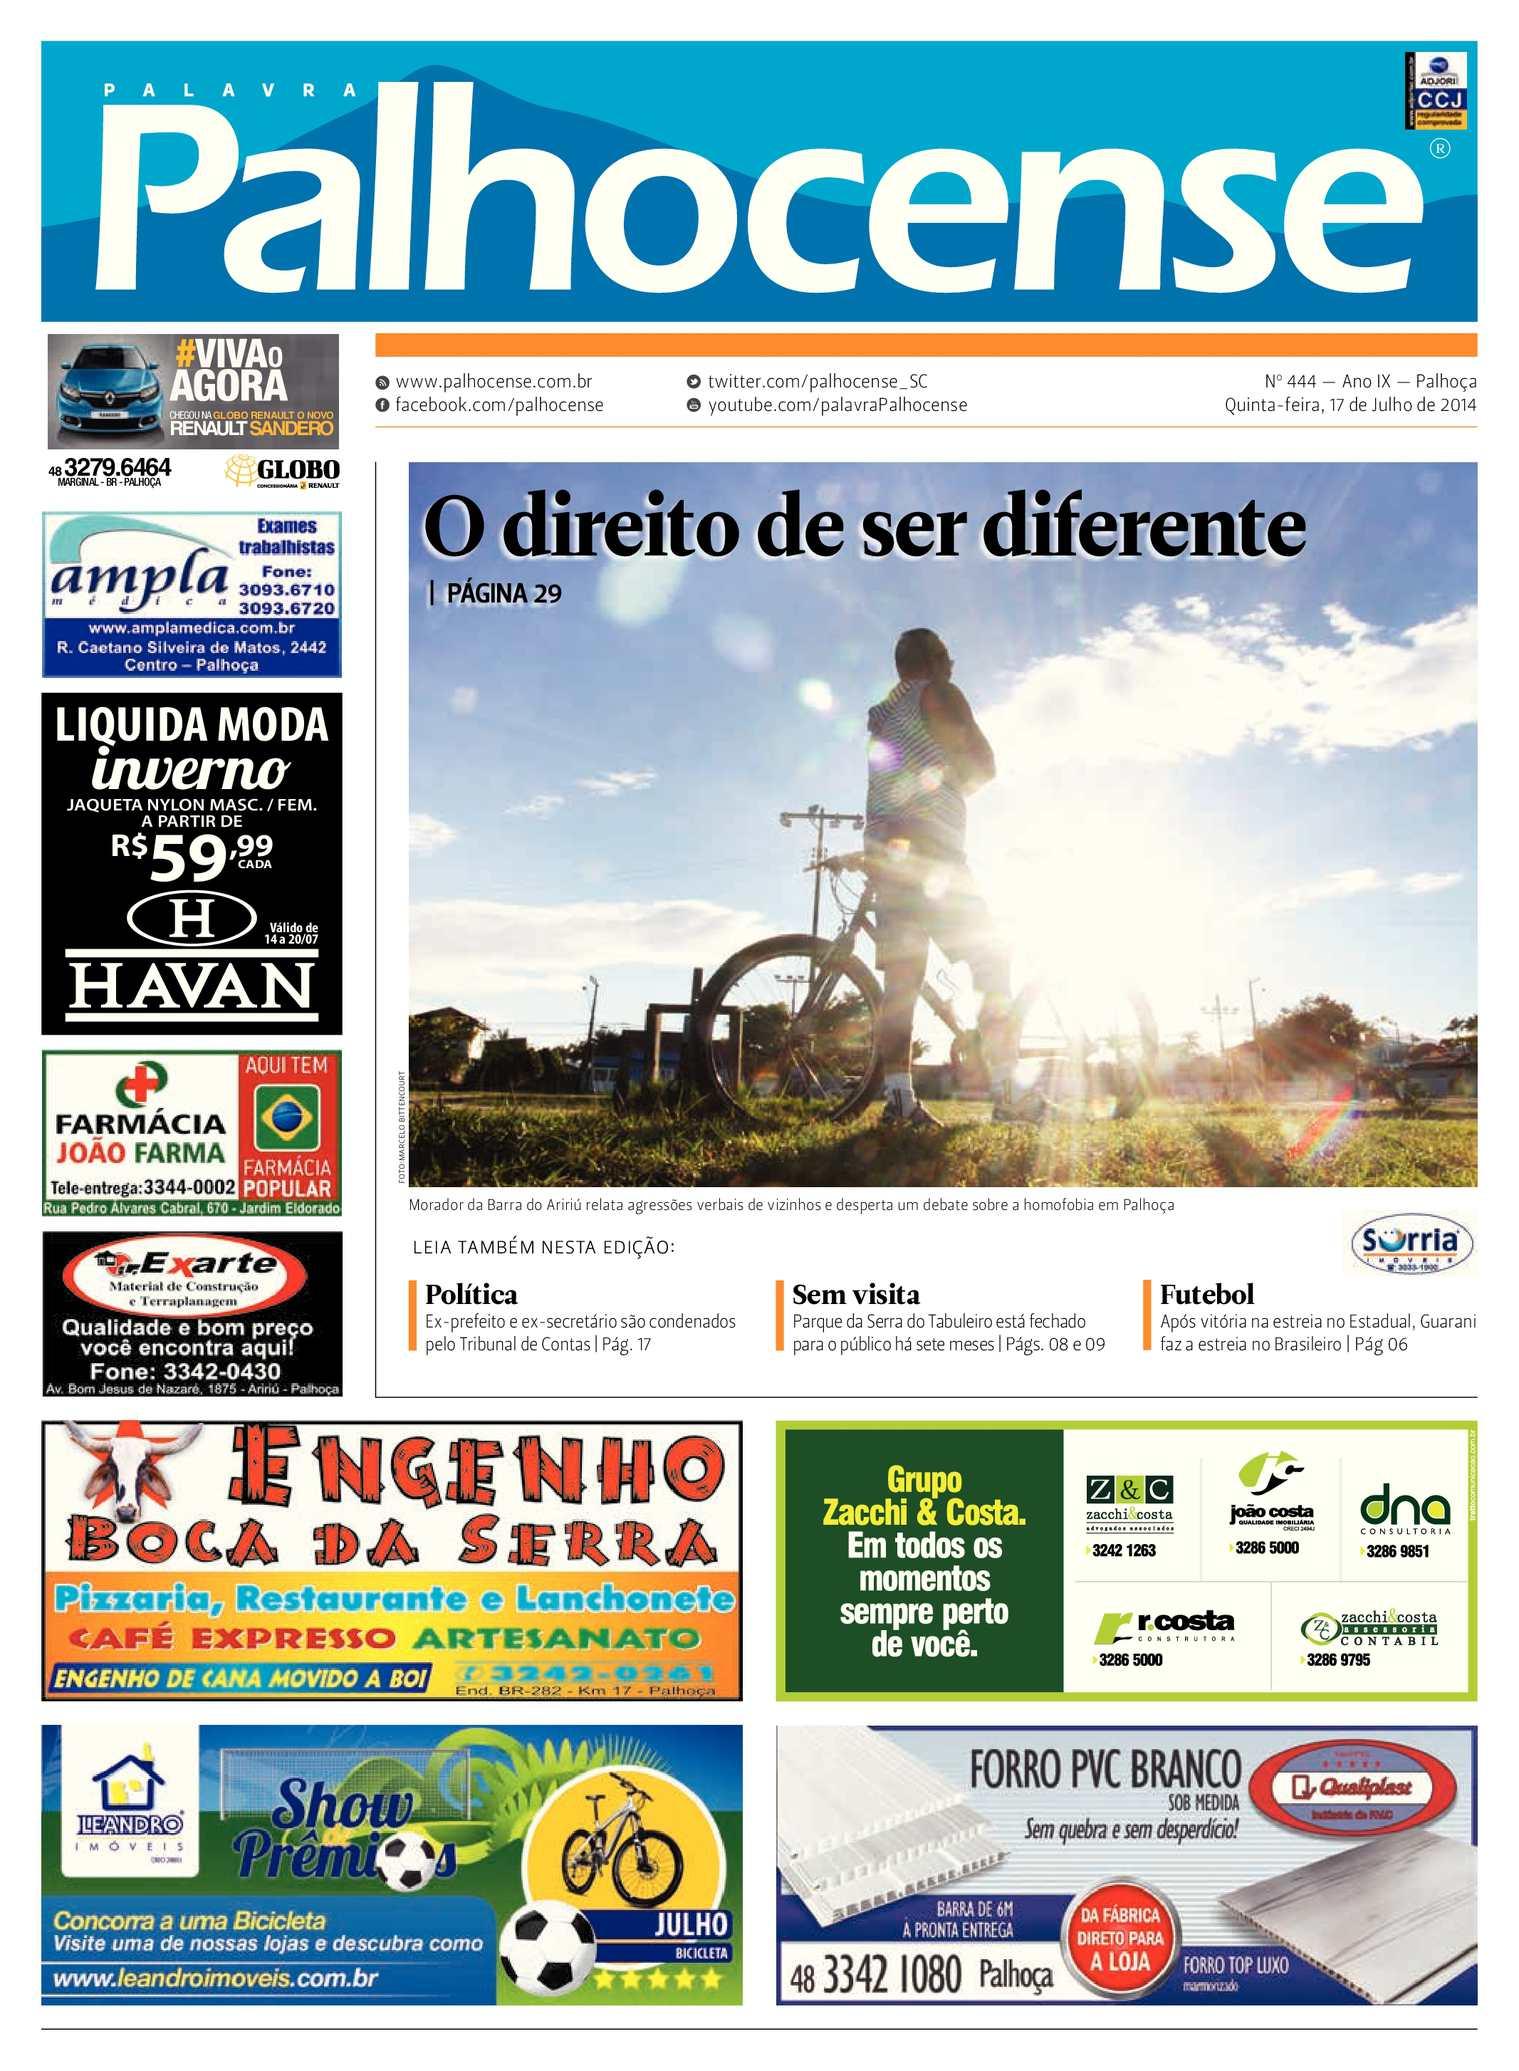 Calaméo - Jornal Palavra Palhocense - Edição 444 4cb96d8a8476d